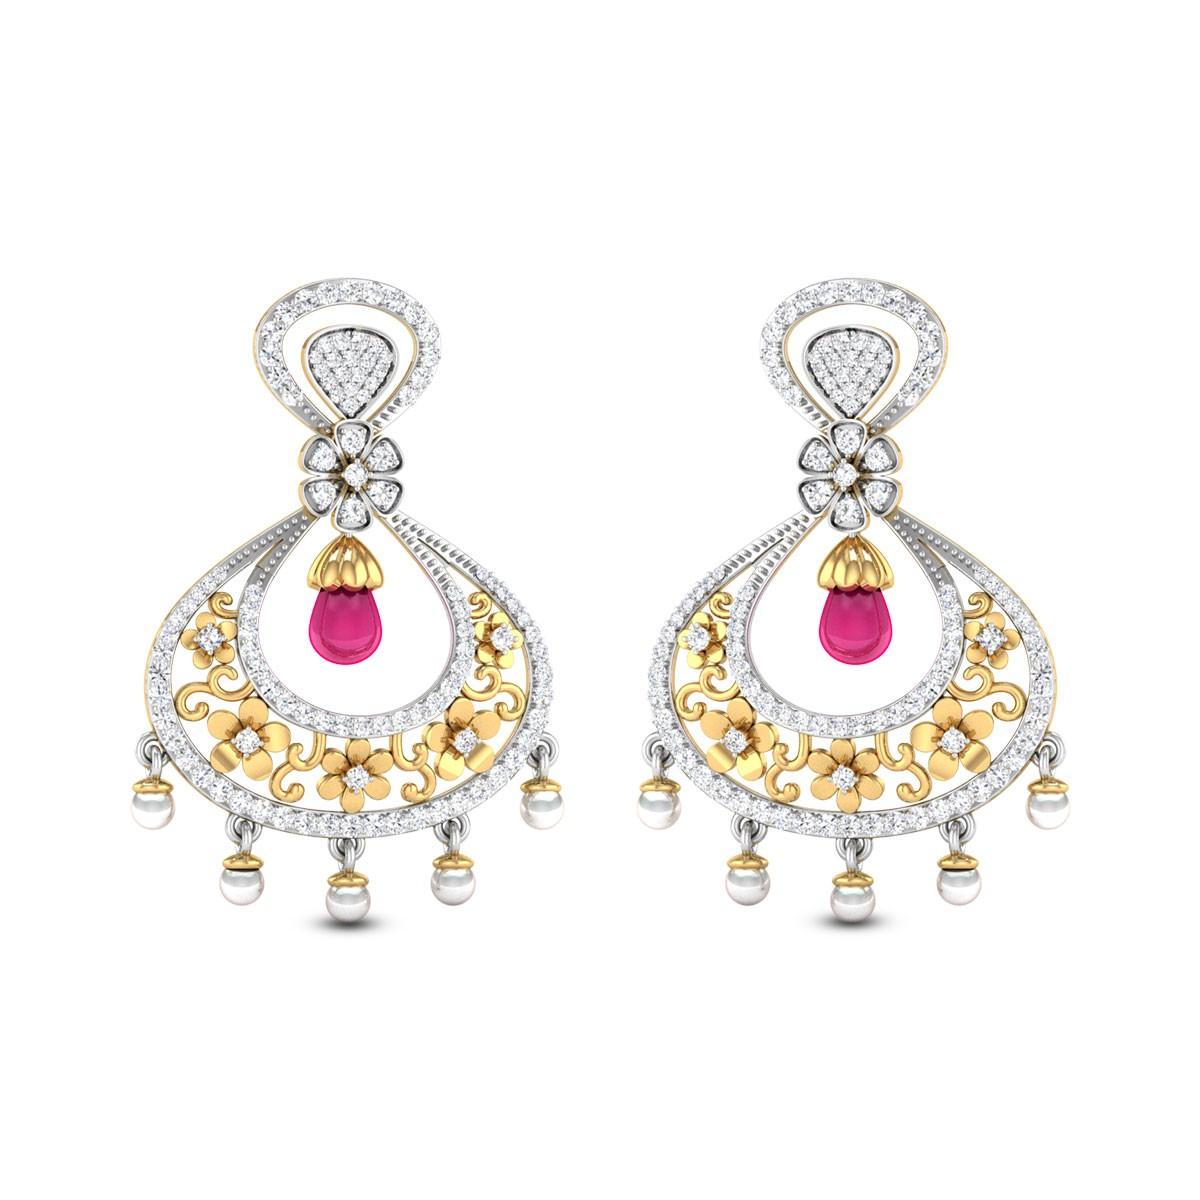 Dendritic Eight Diamond Earrings